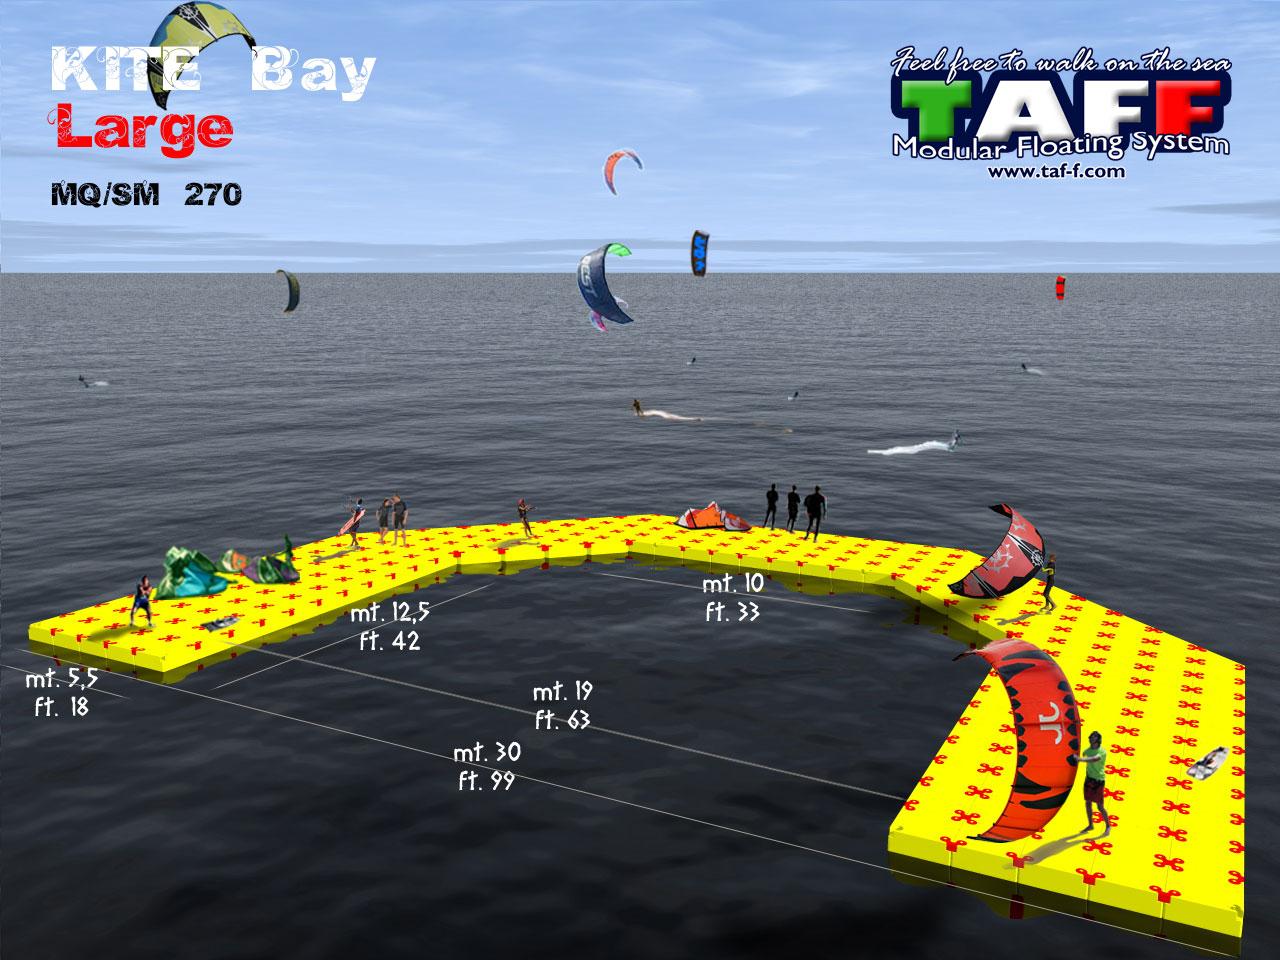 kite-bay-Large.jpg